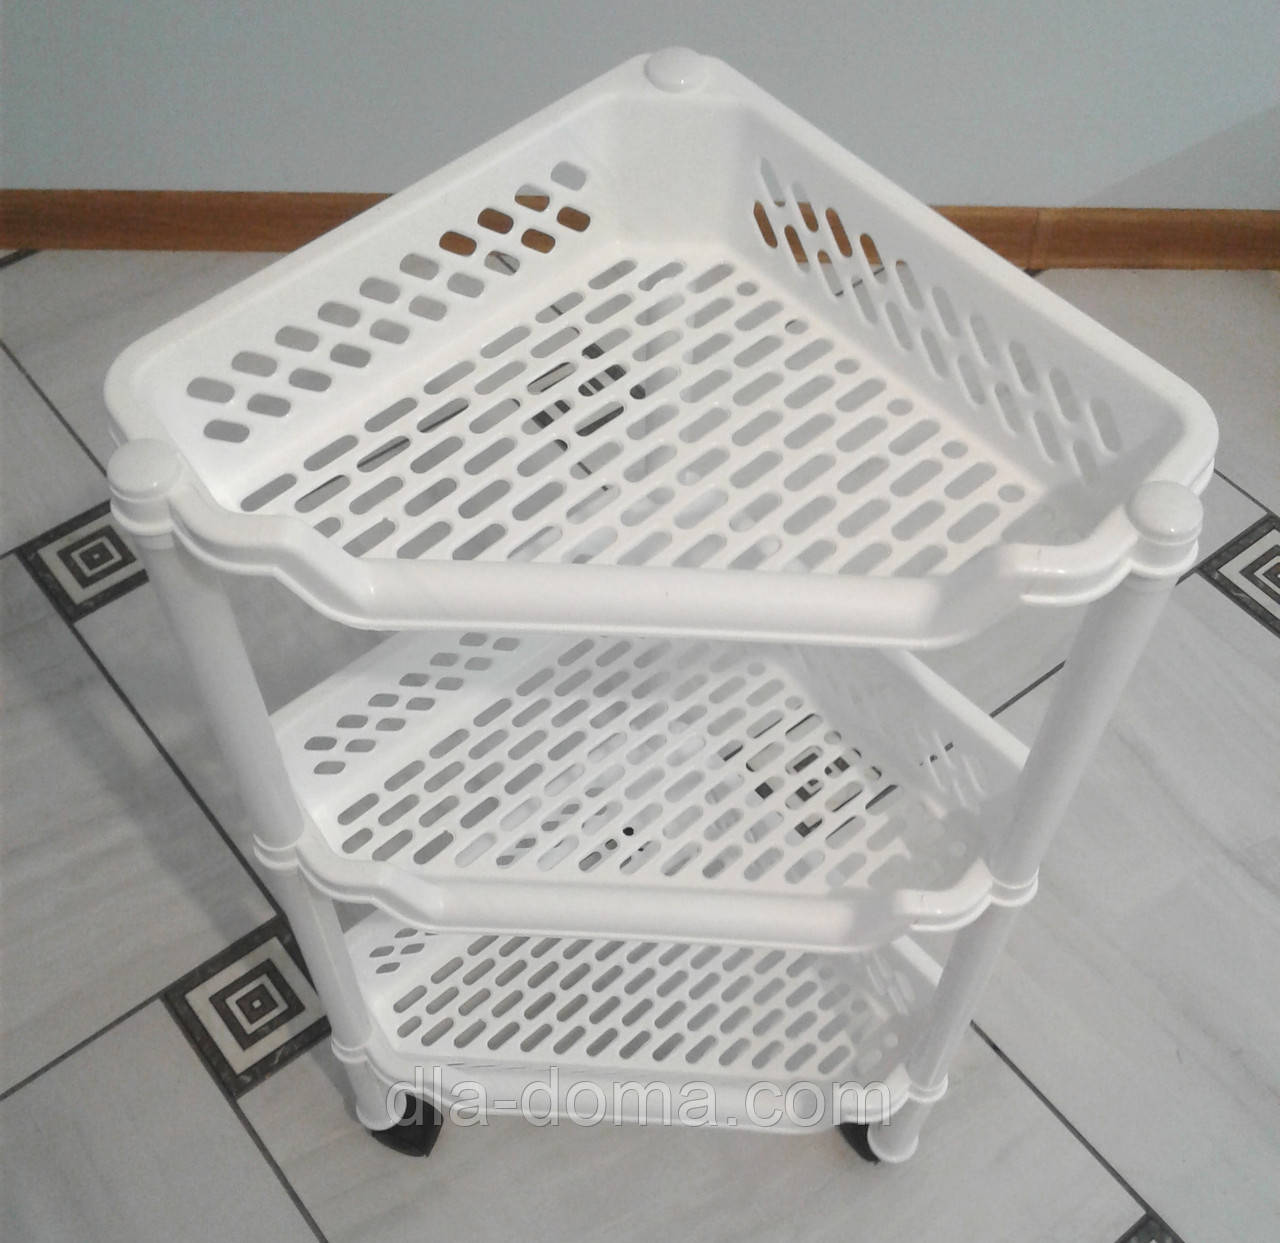 Этажерка пластиковая угловая белая